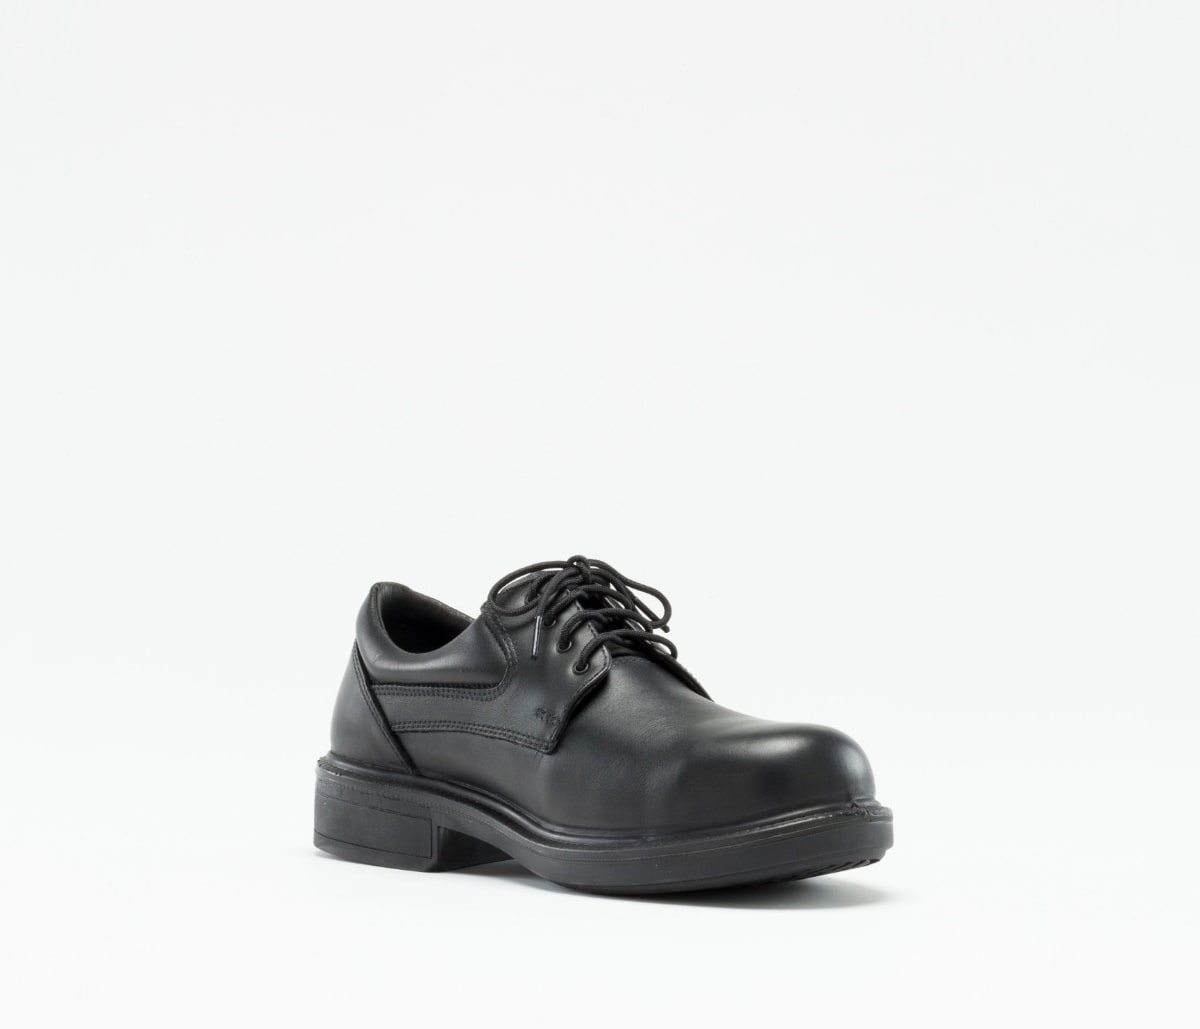 Manly - Black